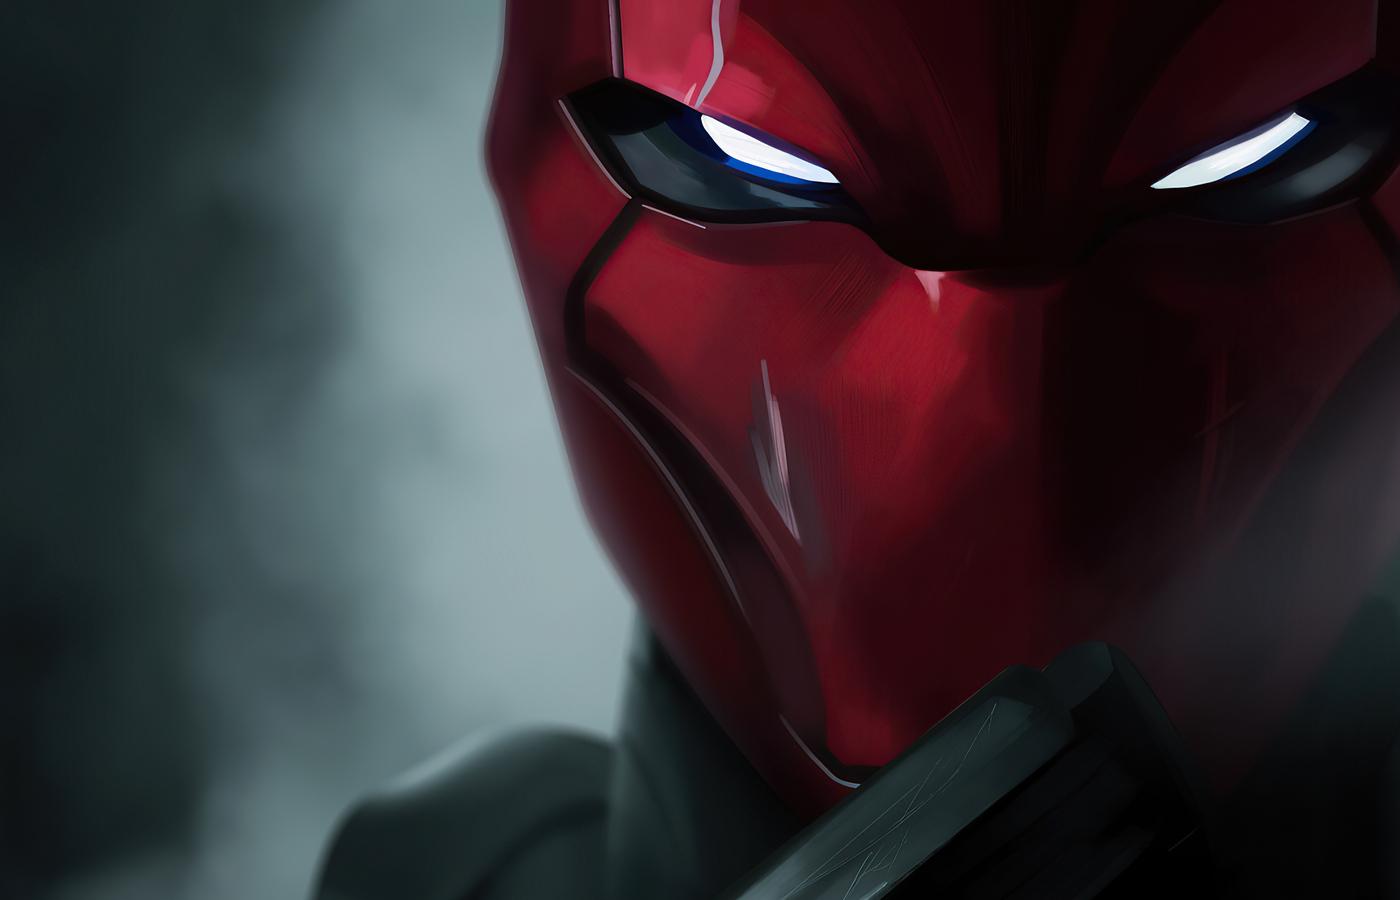 red-hood-2020-x7.jpg